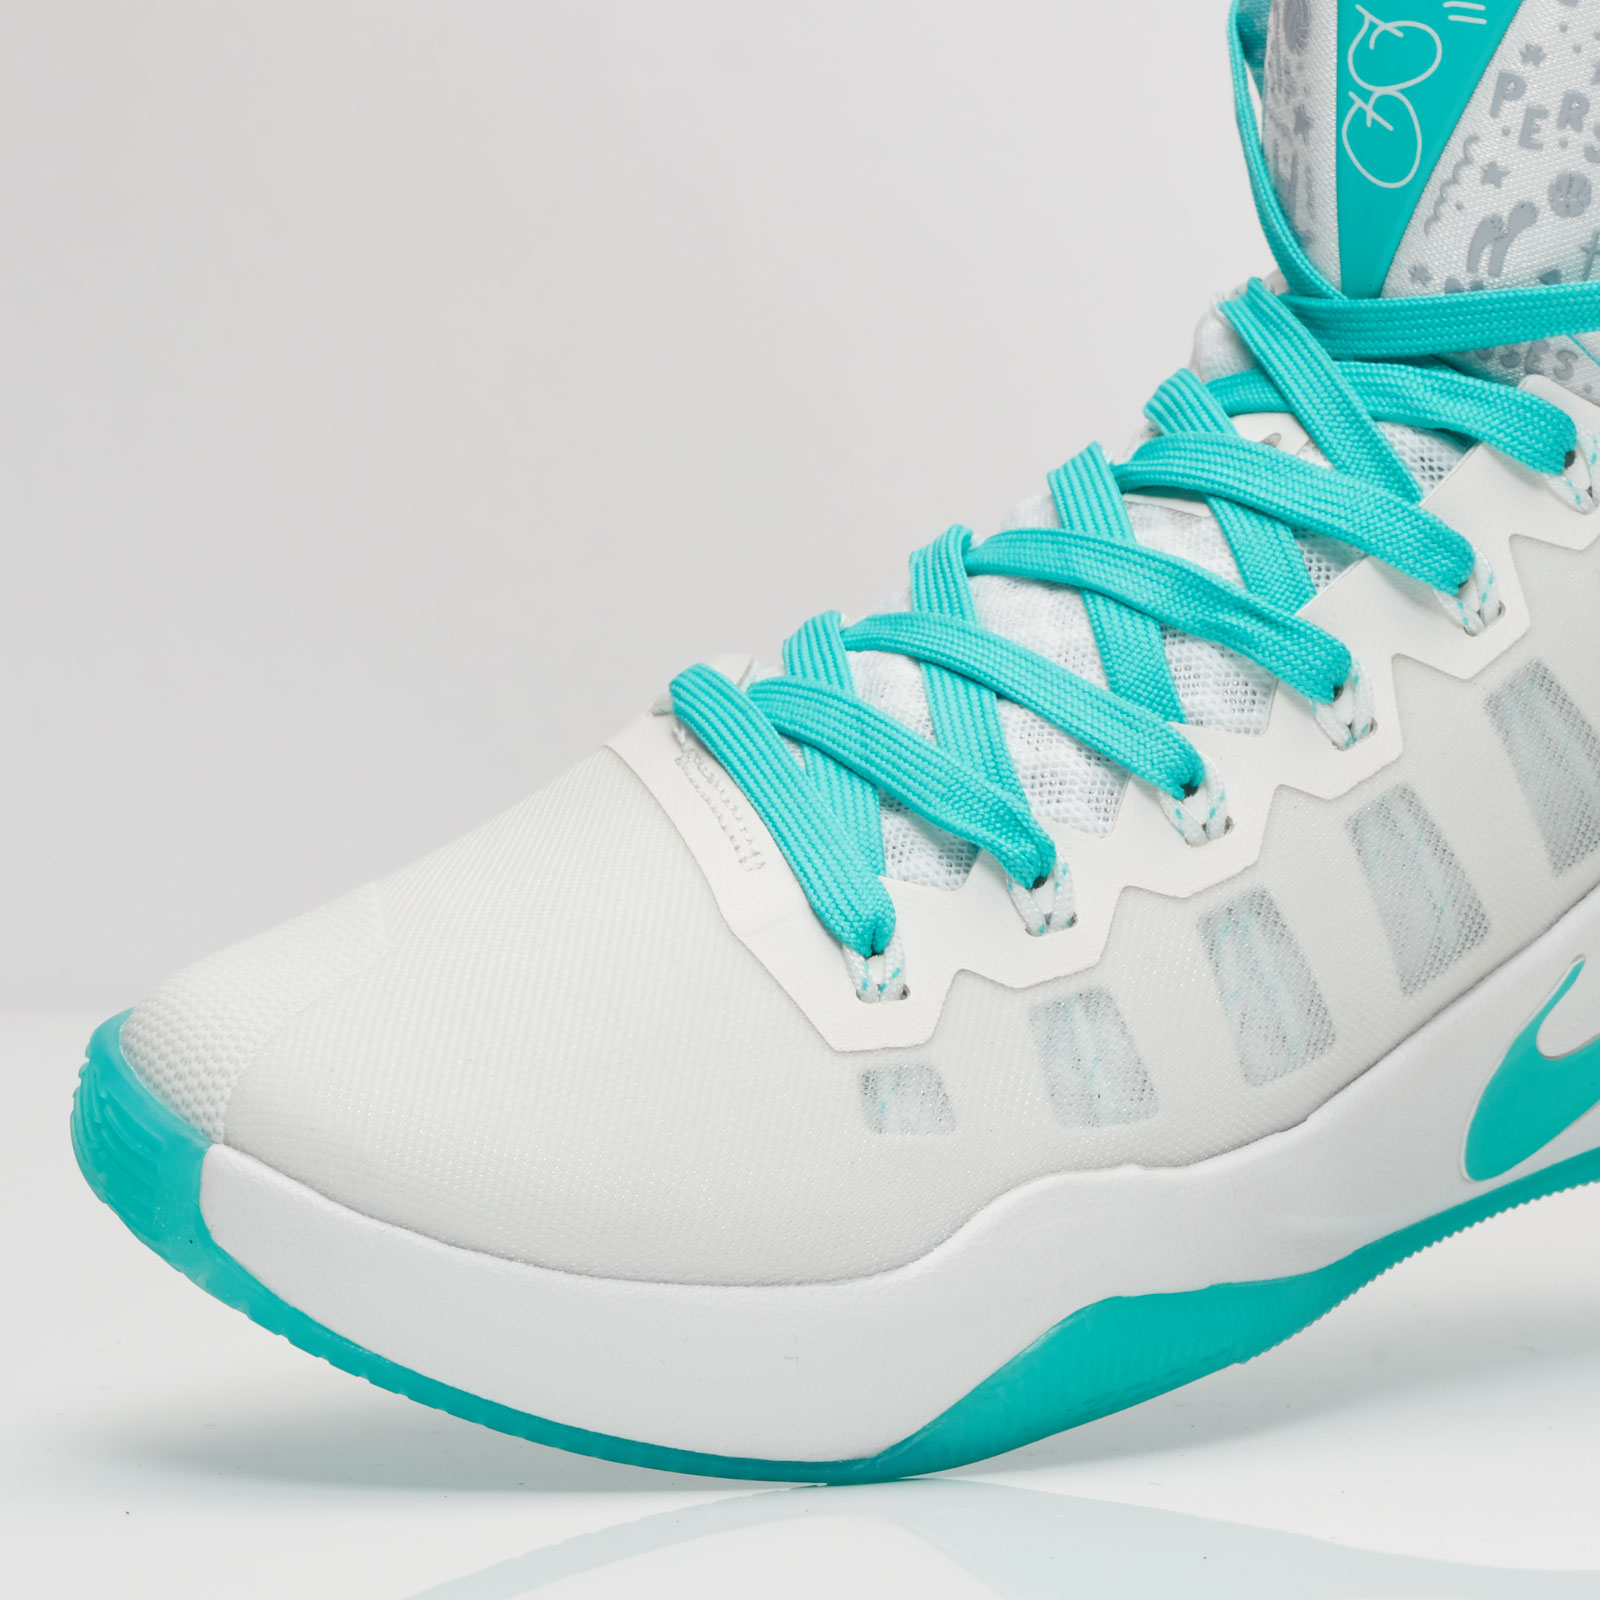 7e402c305f0 Nike Hyperdunk 2016 Limited Edition - 869484-999 - Sneakersnstuff ...